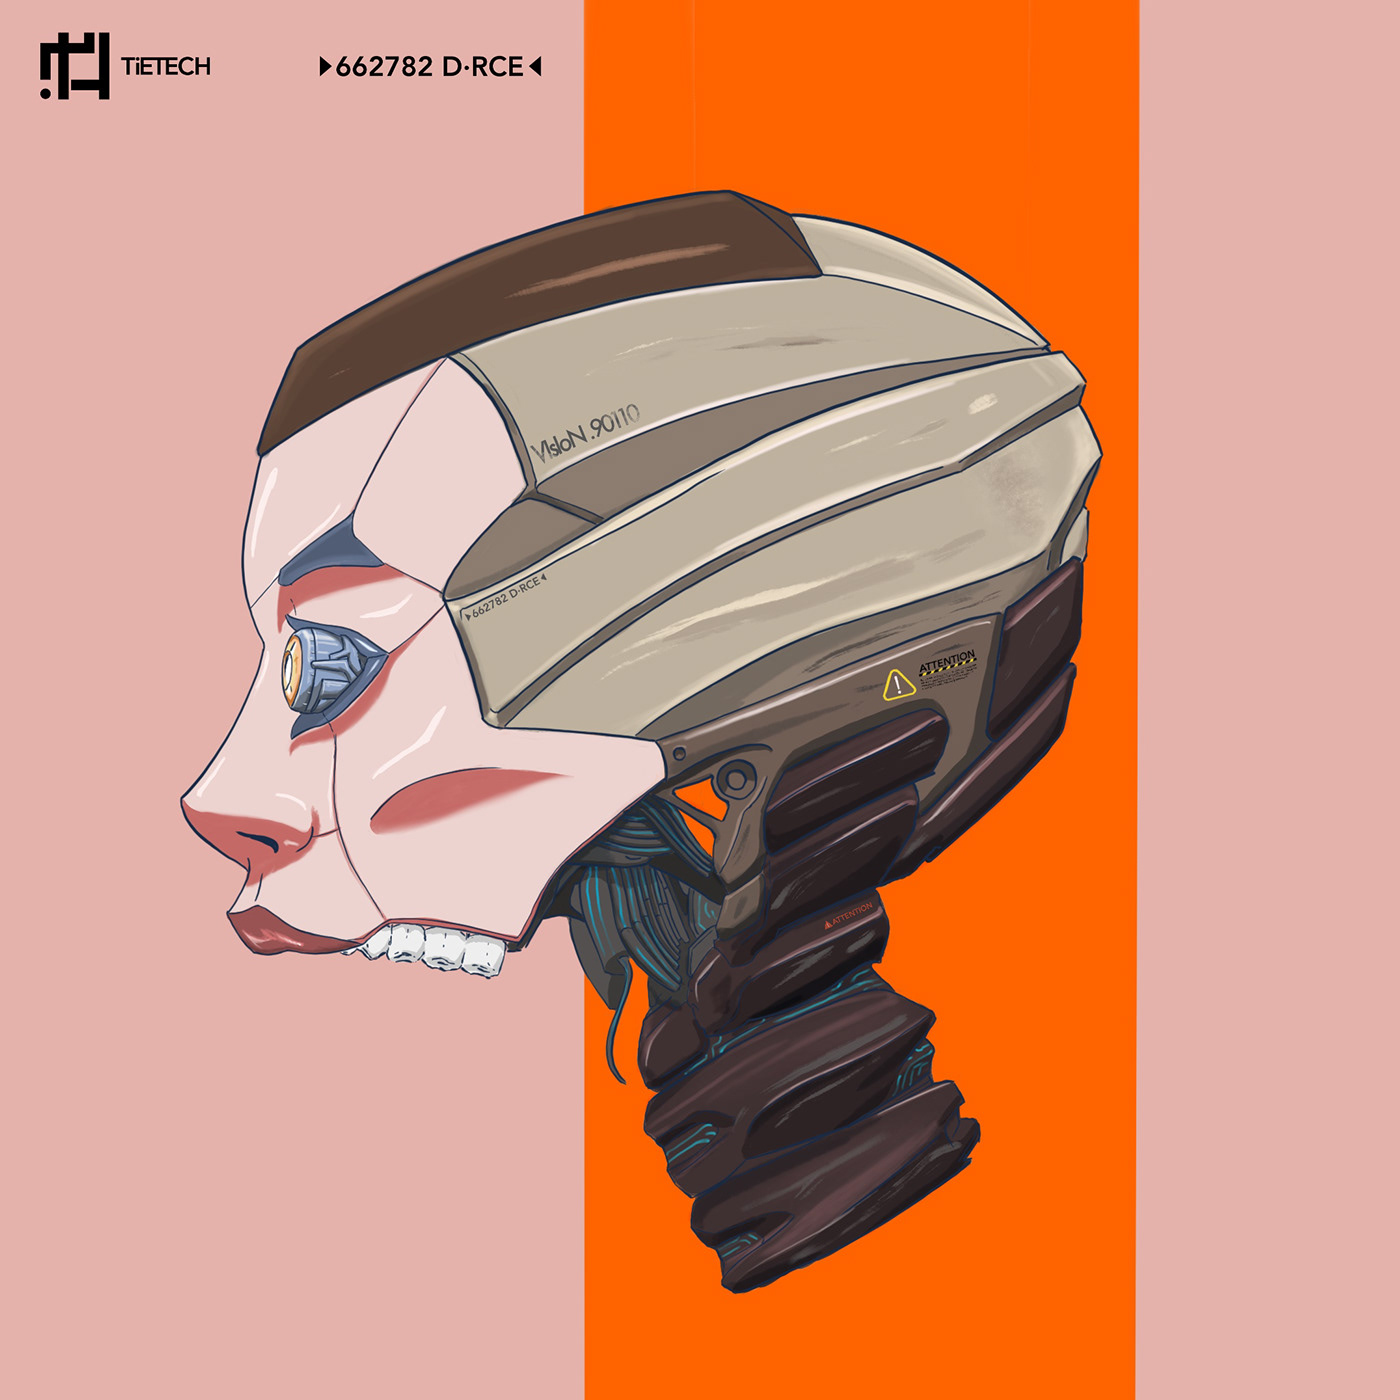 Robot character illustration